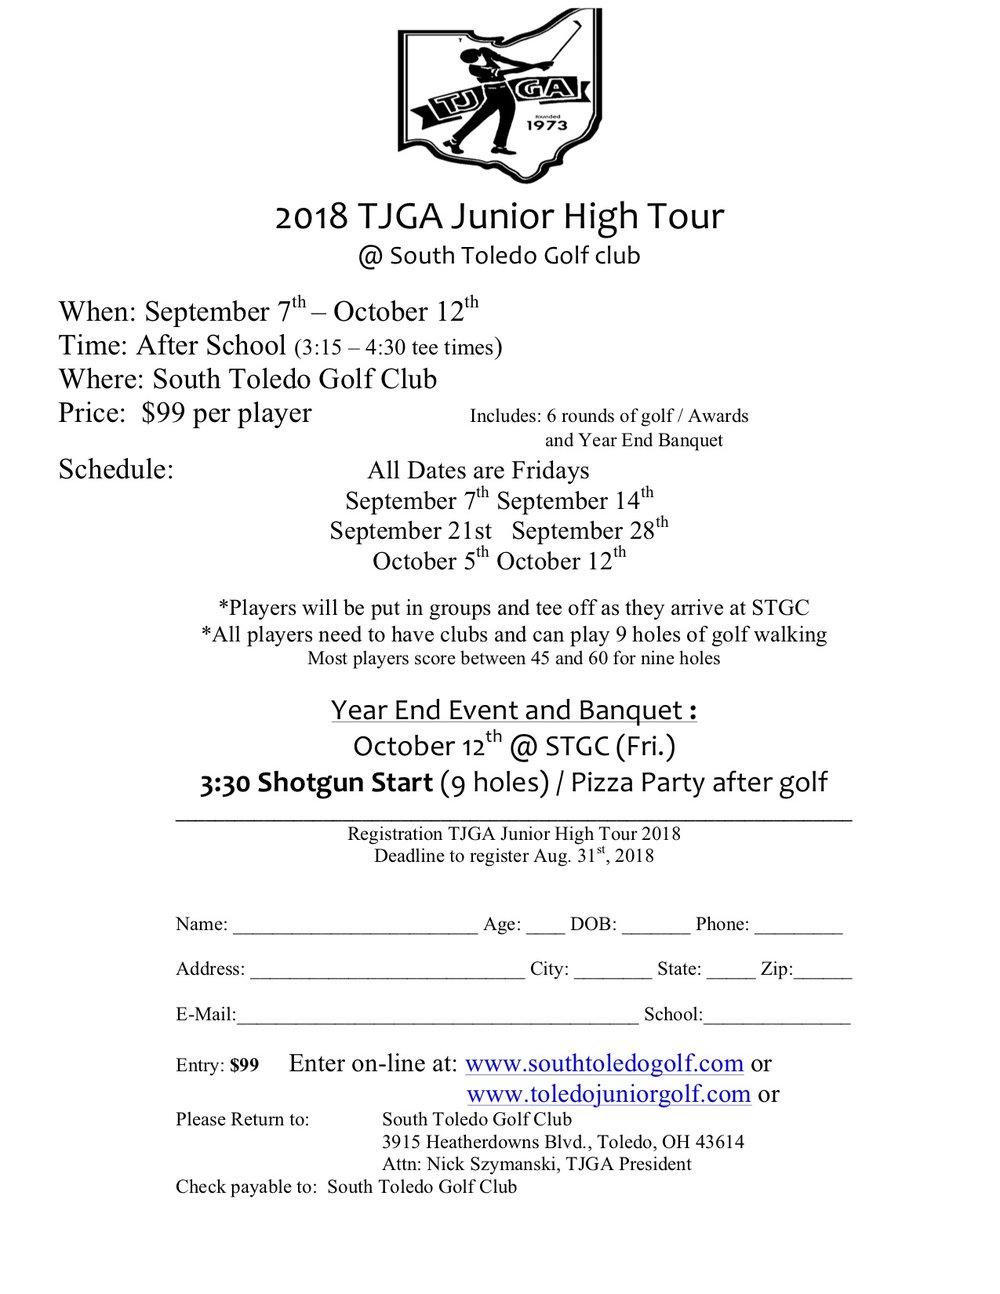 2018 TJGA Junior High Tour 2.jpg